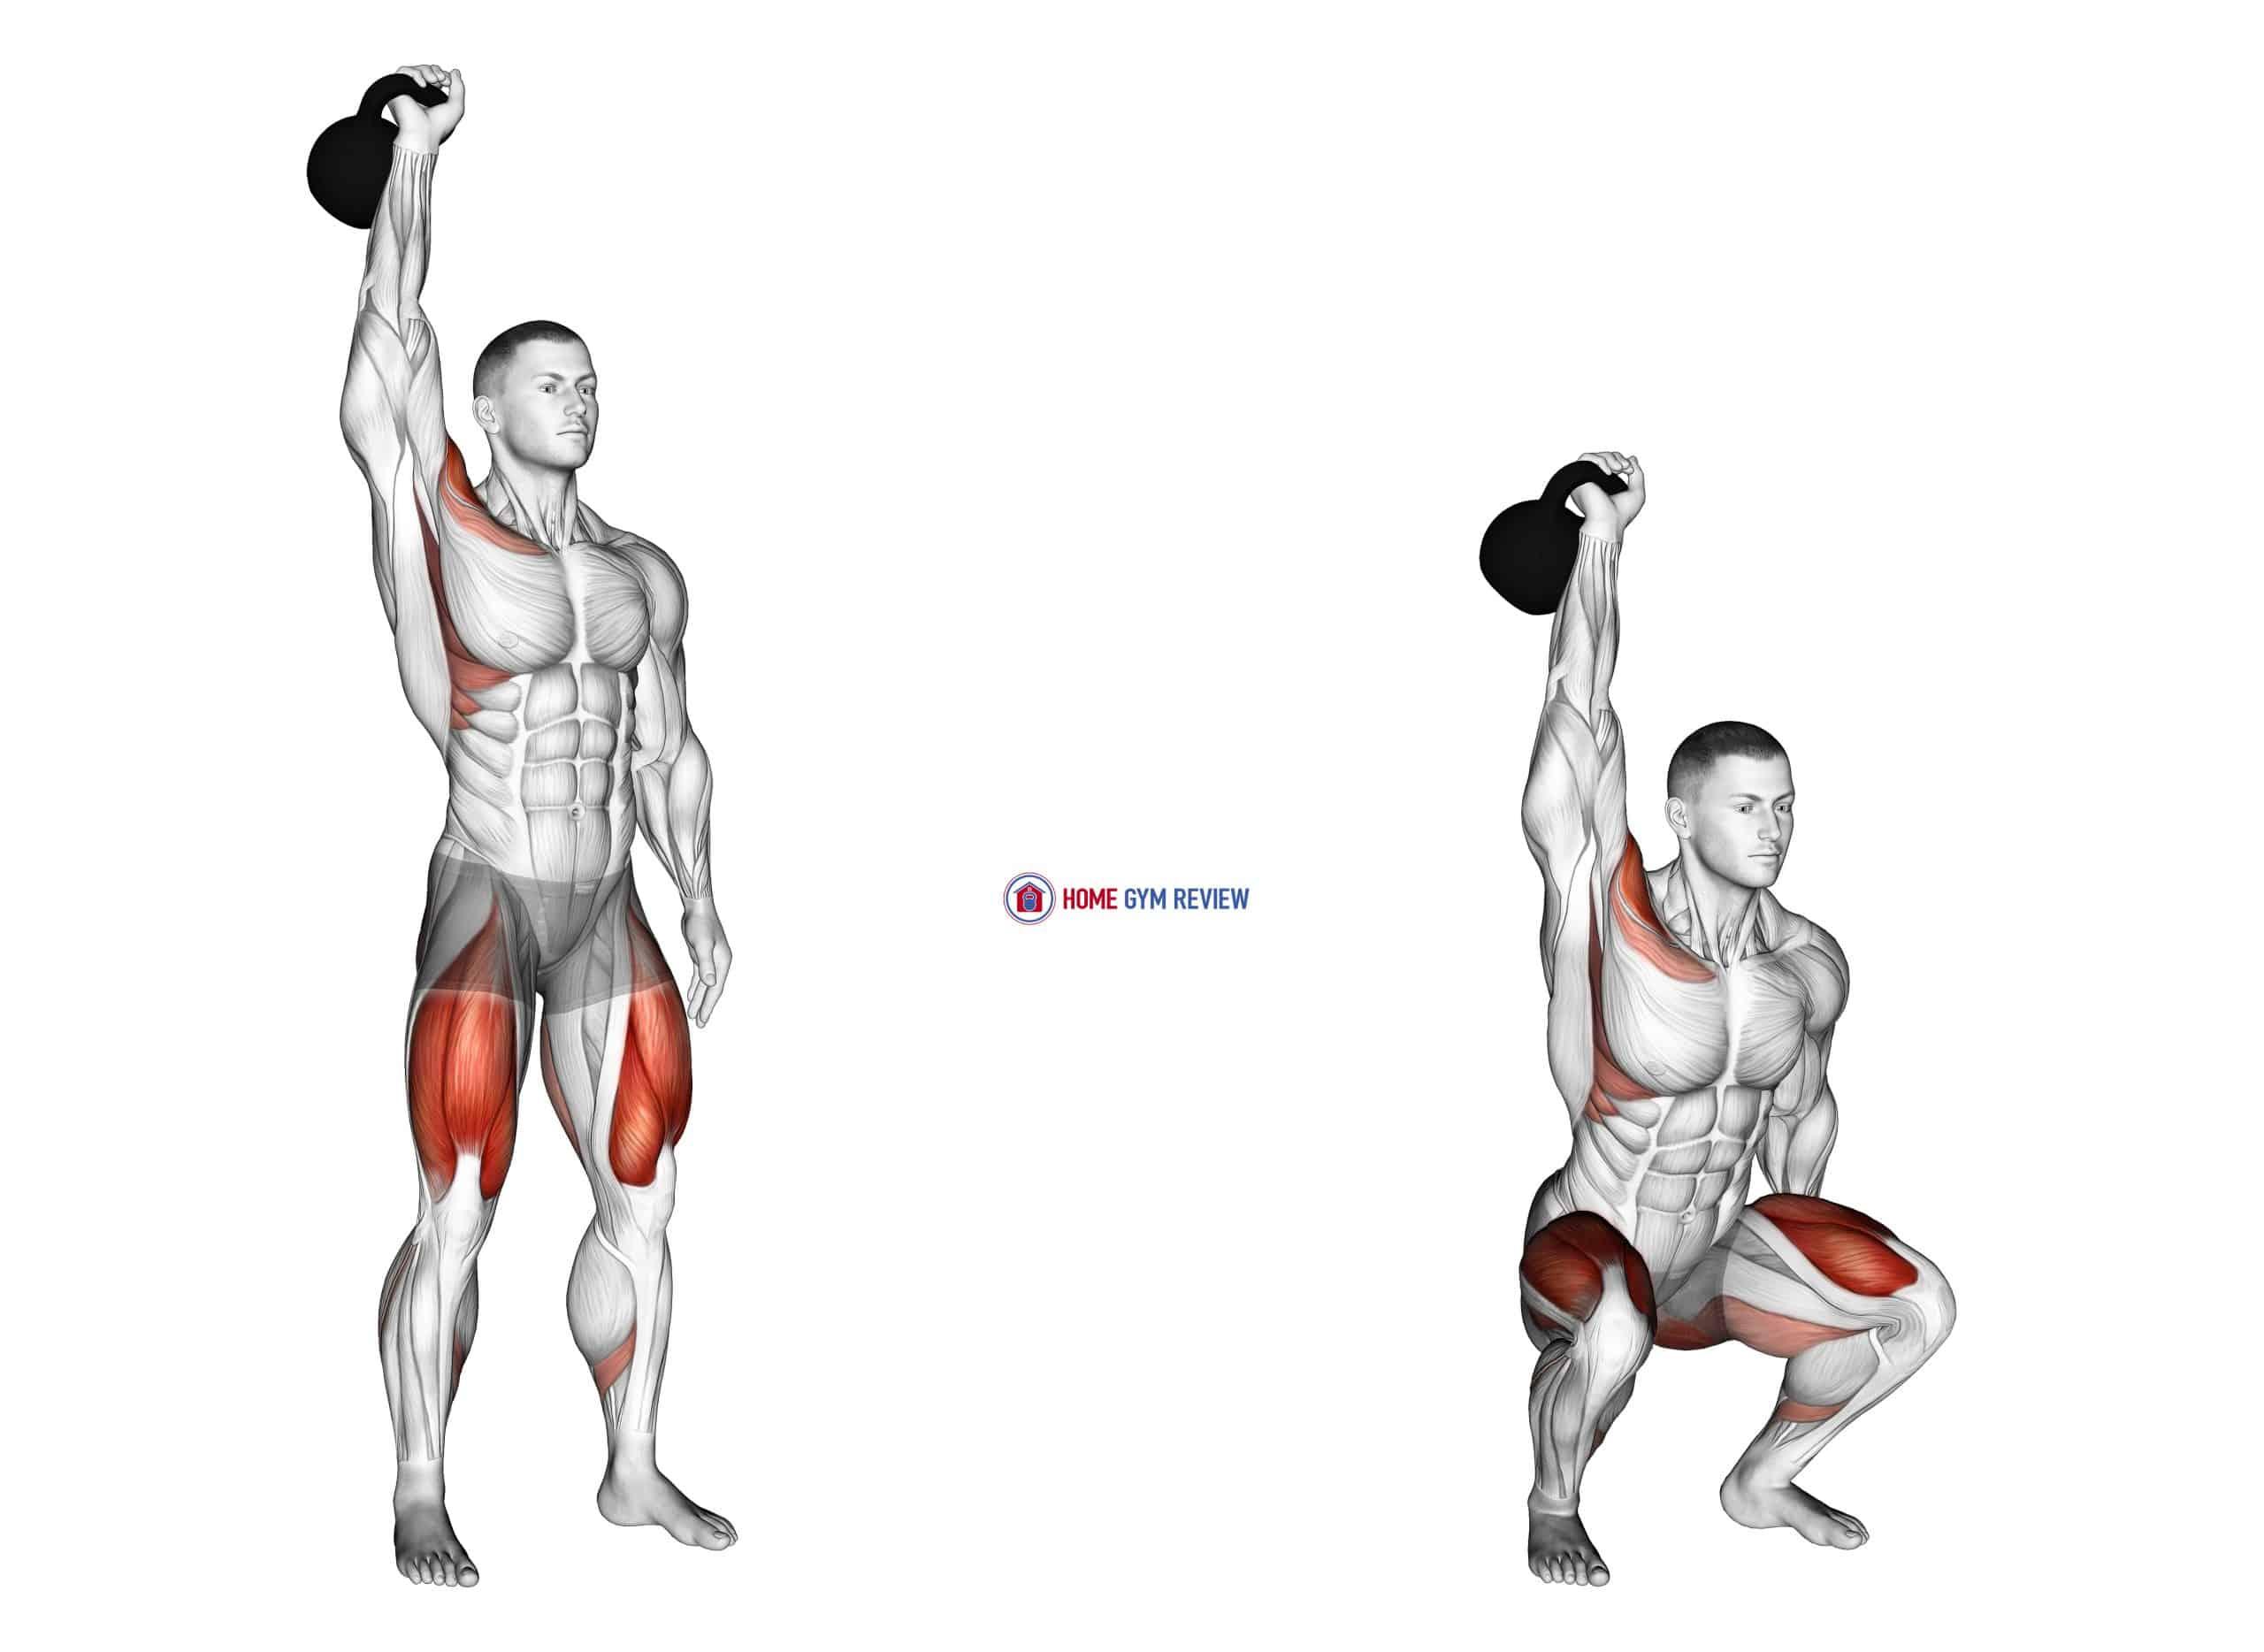 Kettlebell One Arm Overhead Squat